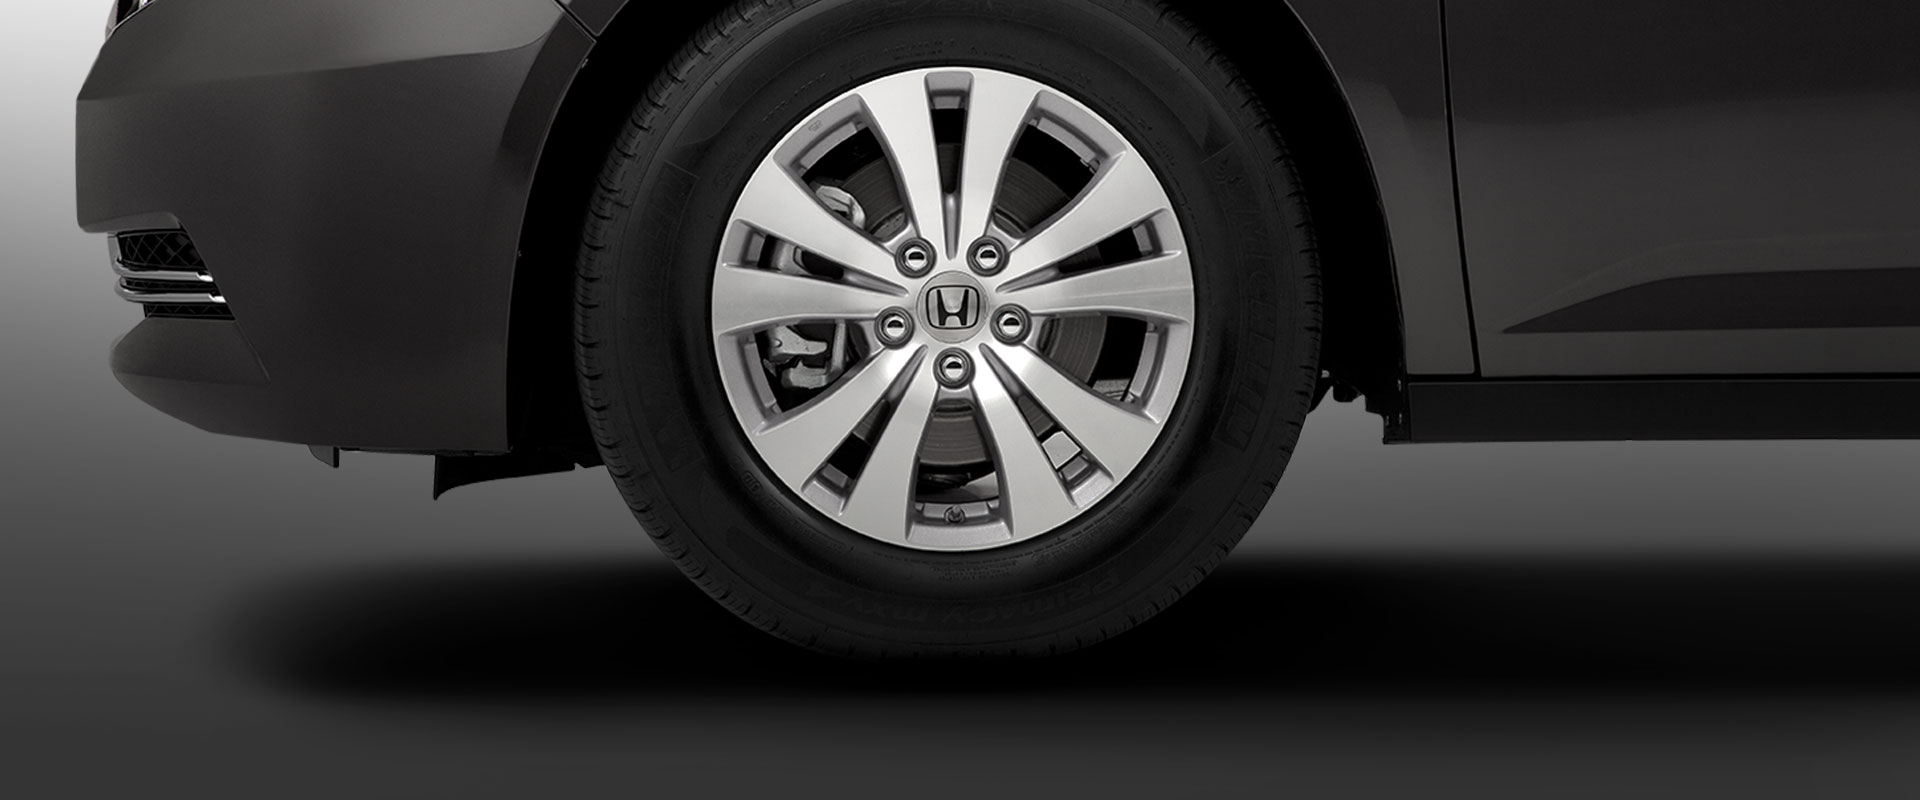 2017 Honda Odyssey Electronic Brake Distribution